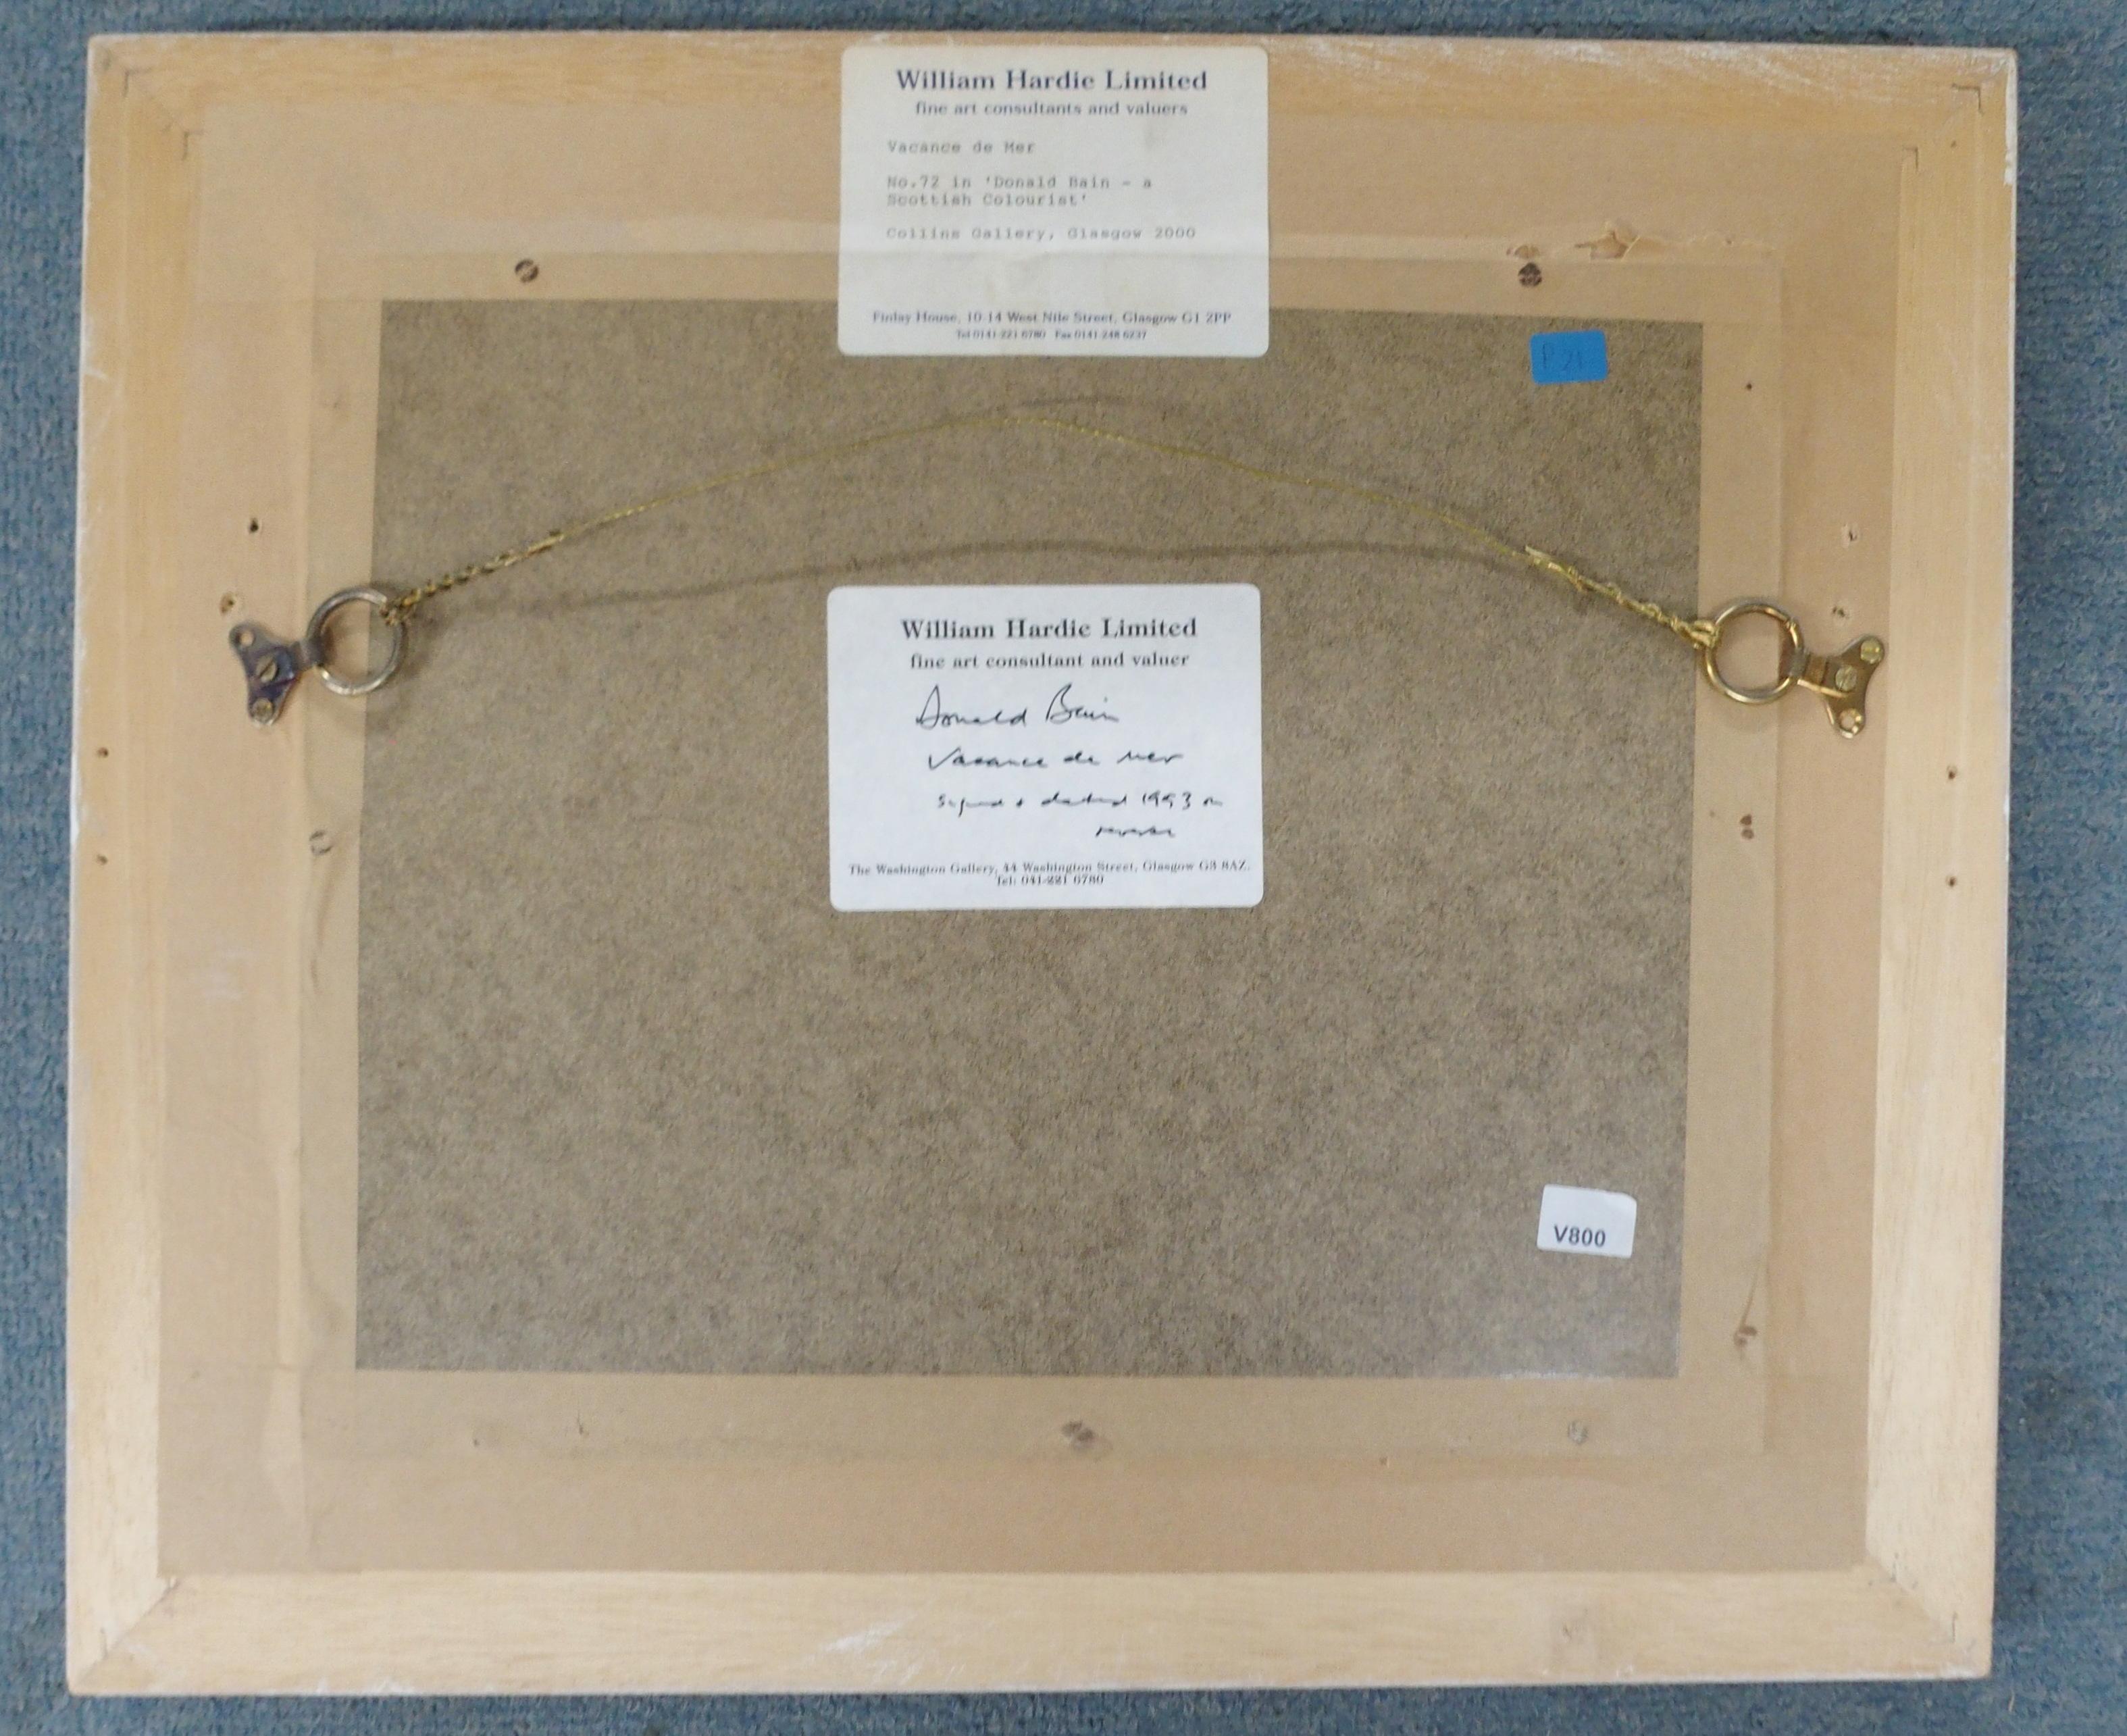 •DONALD BAIN (SCOTTISH 1904-1979) VACANCE DE MER oil on board, signed, 24 x 31cm William Hardie - Image 6 of 6